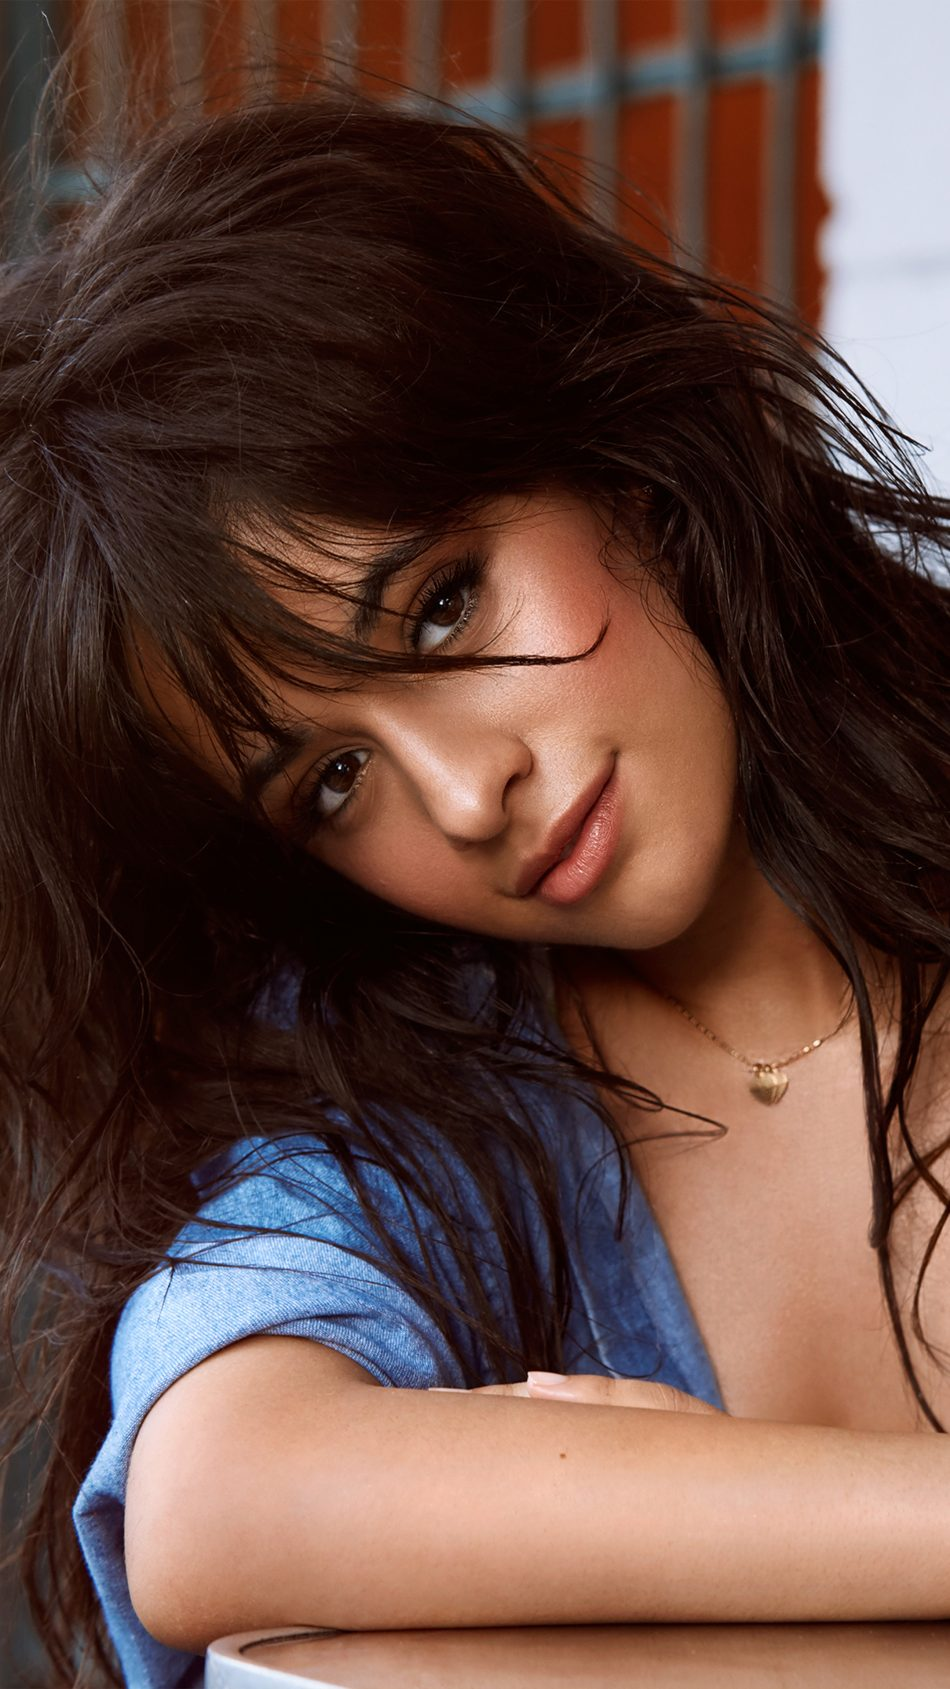 Singer Camila Cabello 2019 4K Ultra HD Mobile Wallpaper